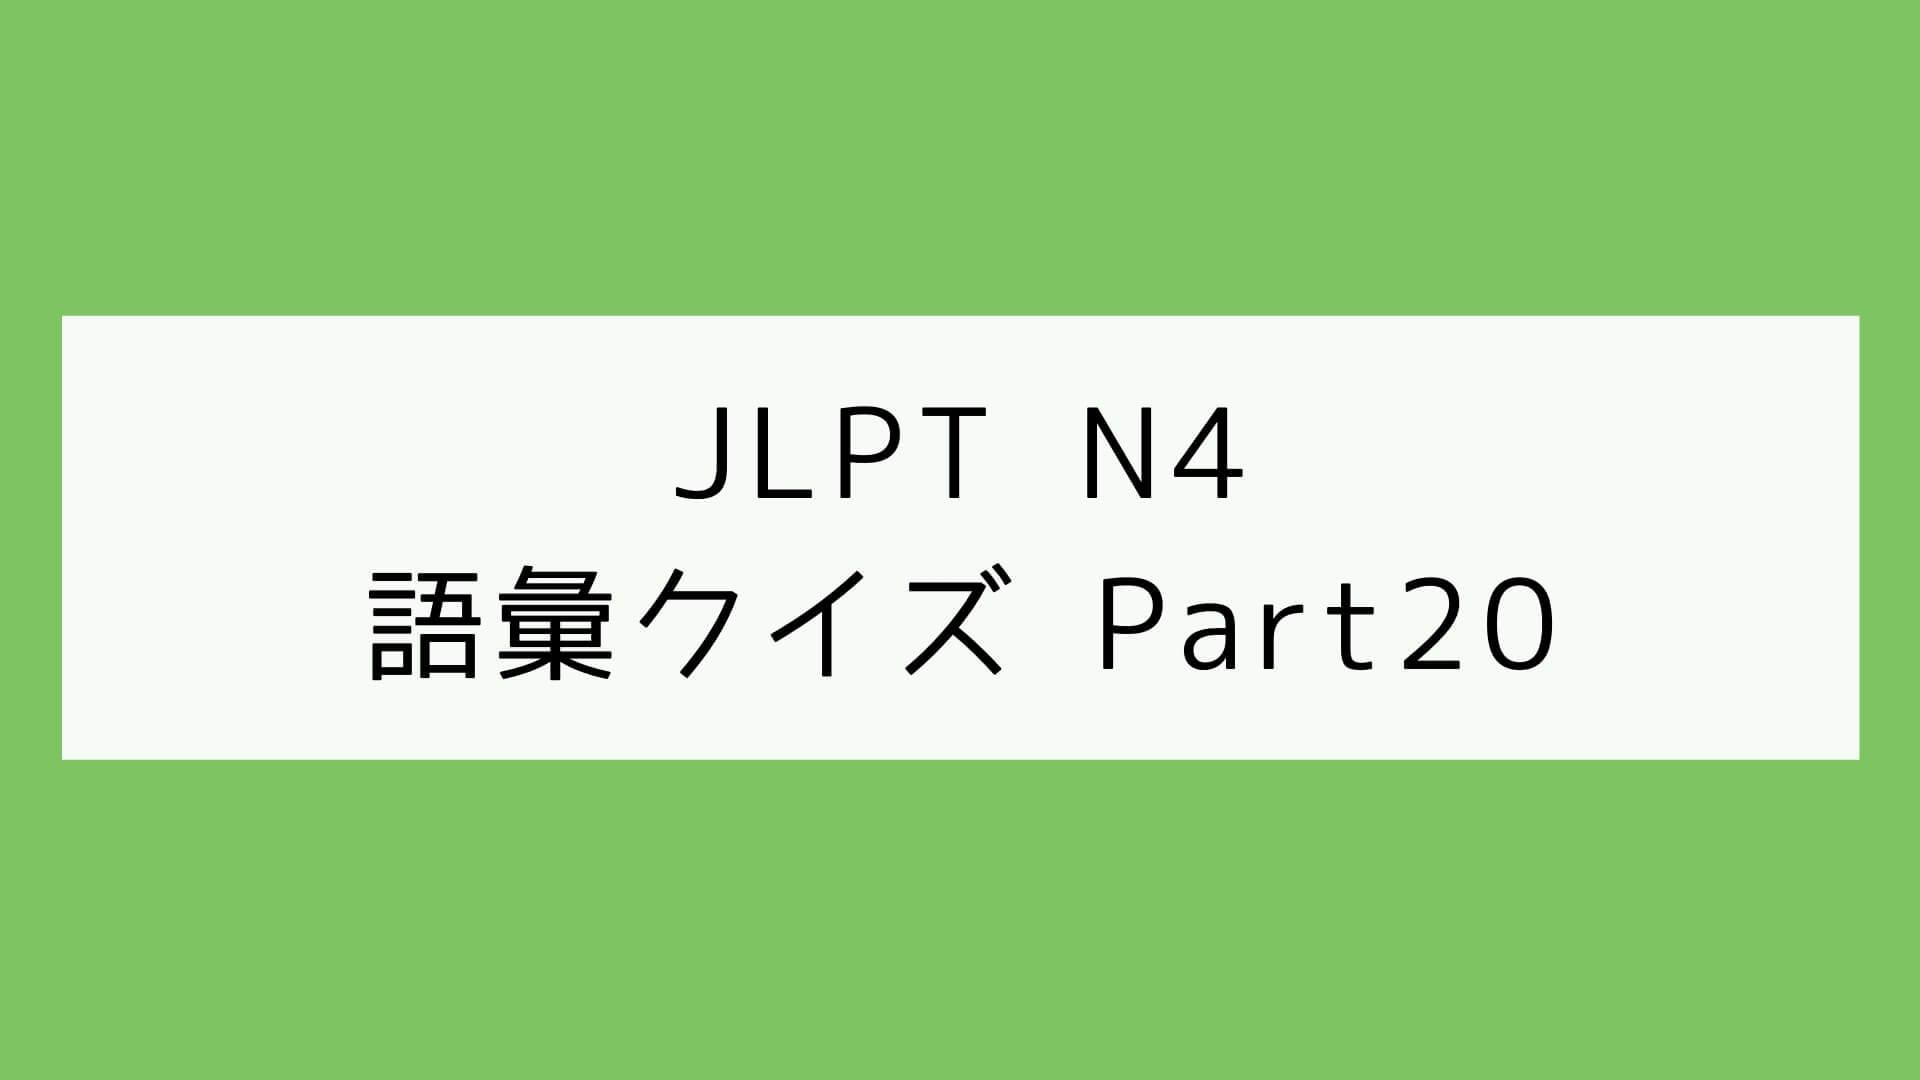 【JLPT N4】語彙クイズ Part20